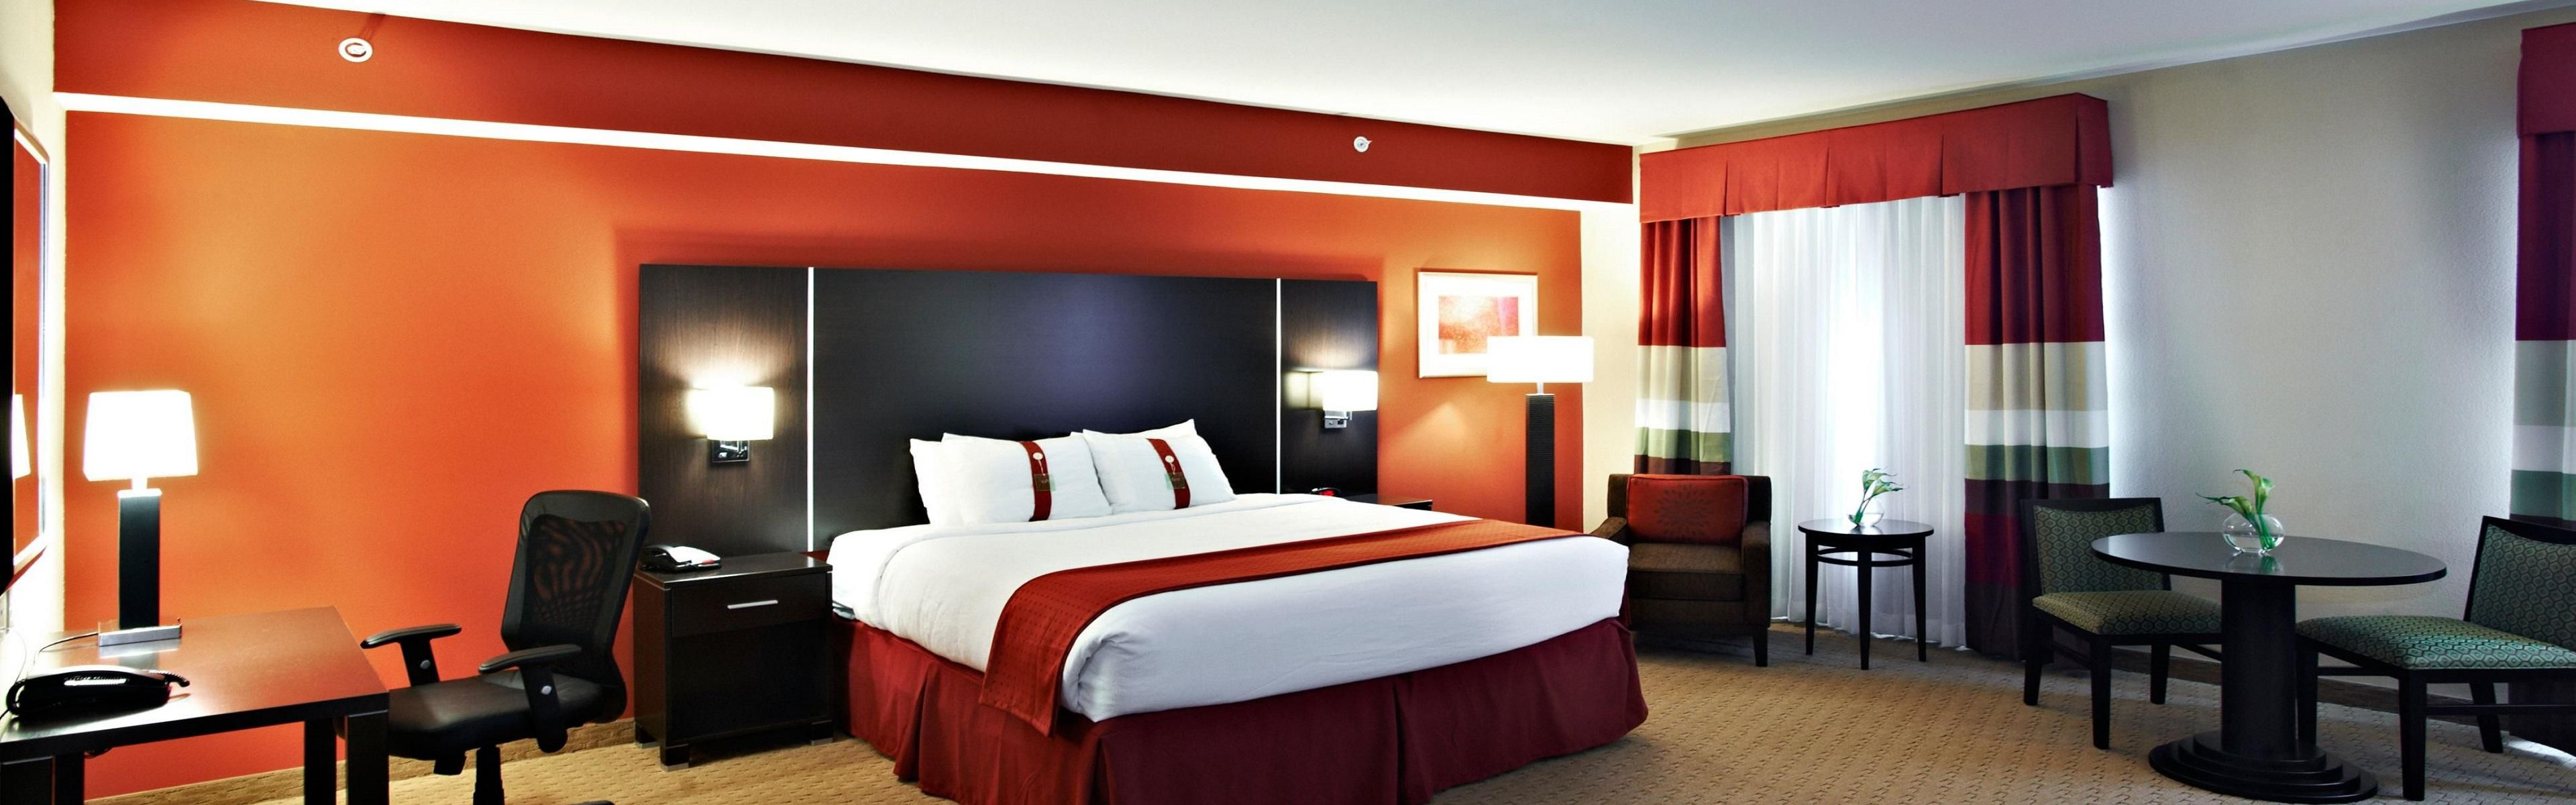 Holiday Inn Birmingham - Hoover image 1